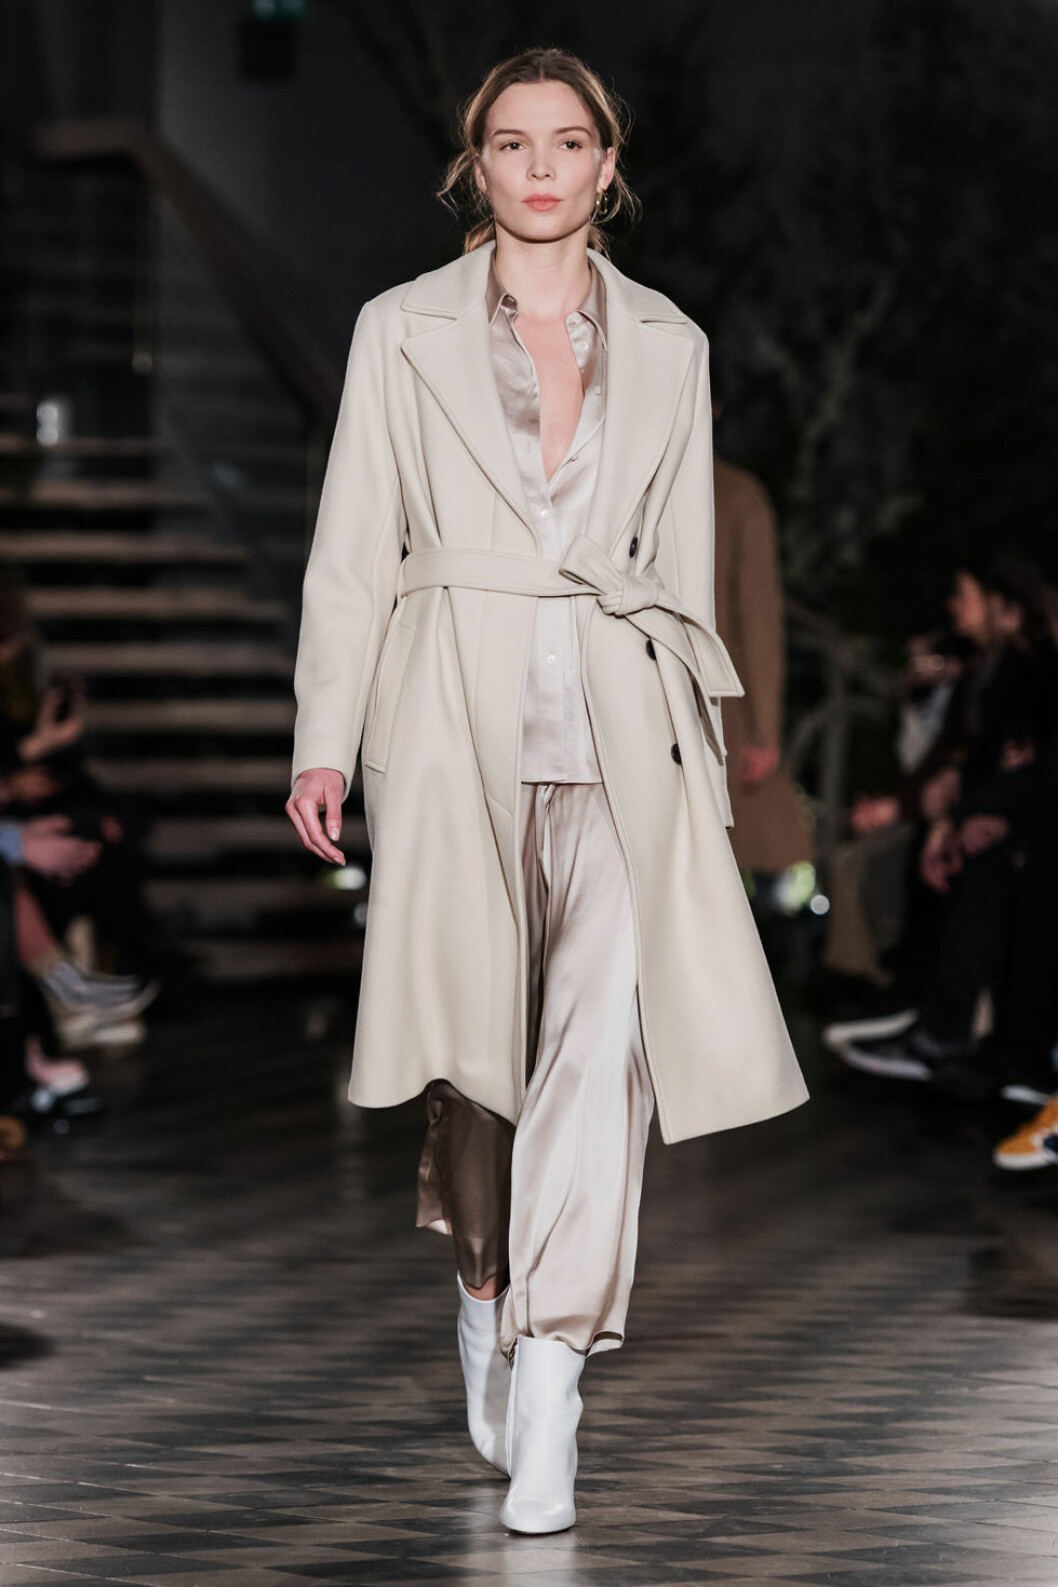 Filippa K AW 18, beige outfit.